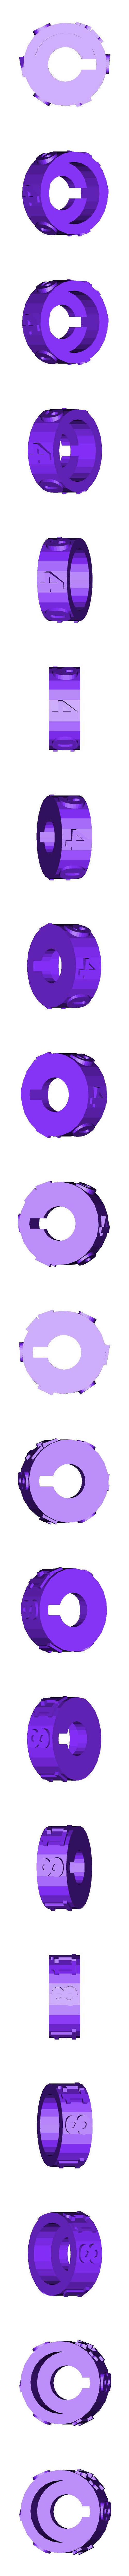 Wheel_3_separate.stl Download free STL file Series Puzzle • 3D printer model, Balkhnarb